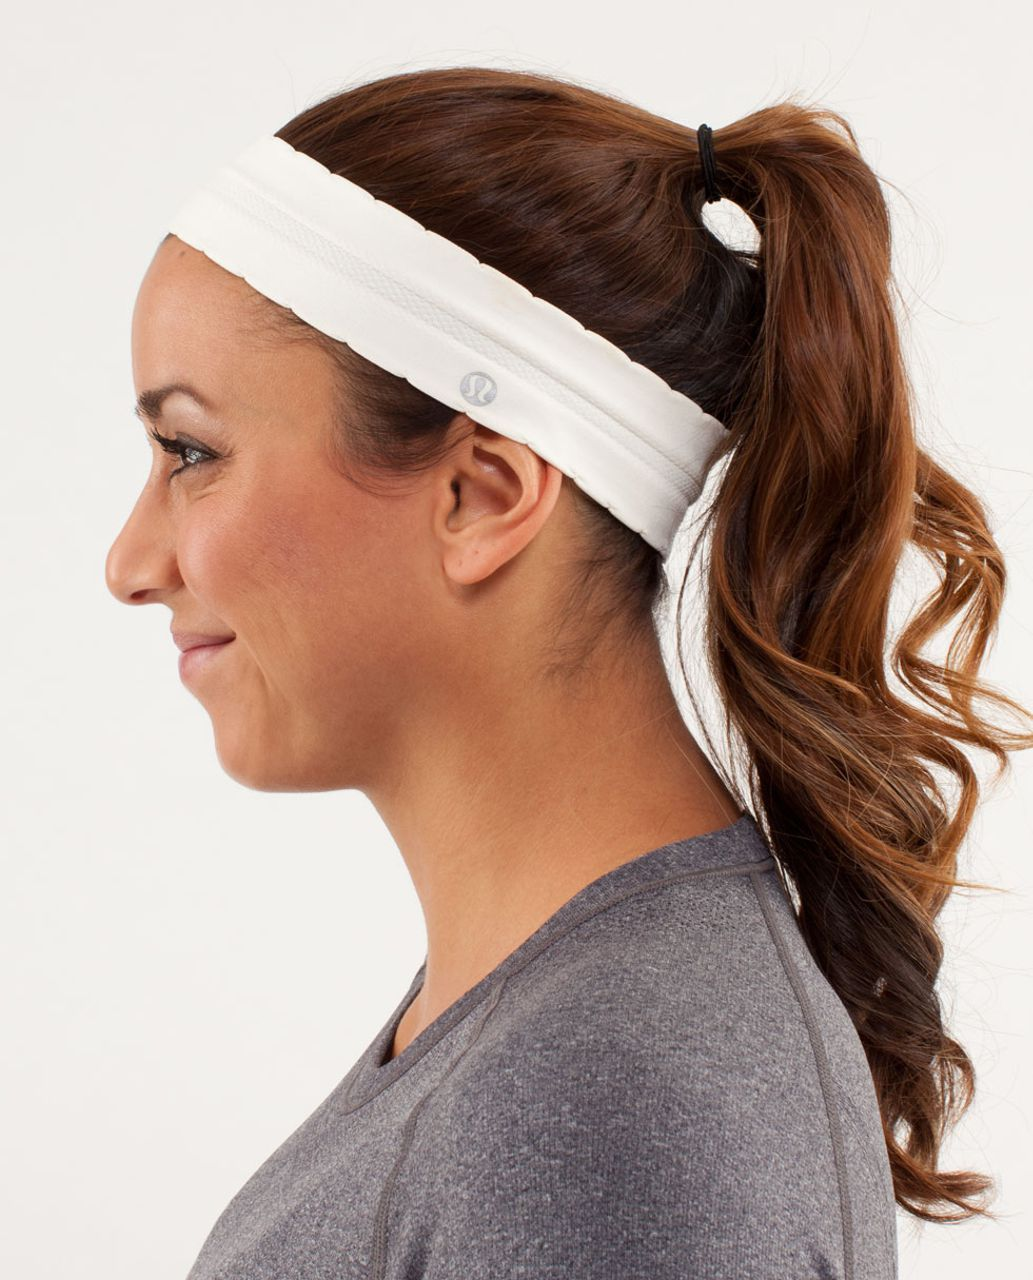 Lululemon Swiftly Headband - Polar Cream